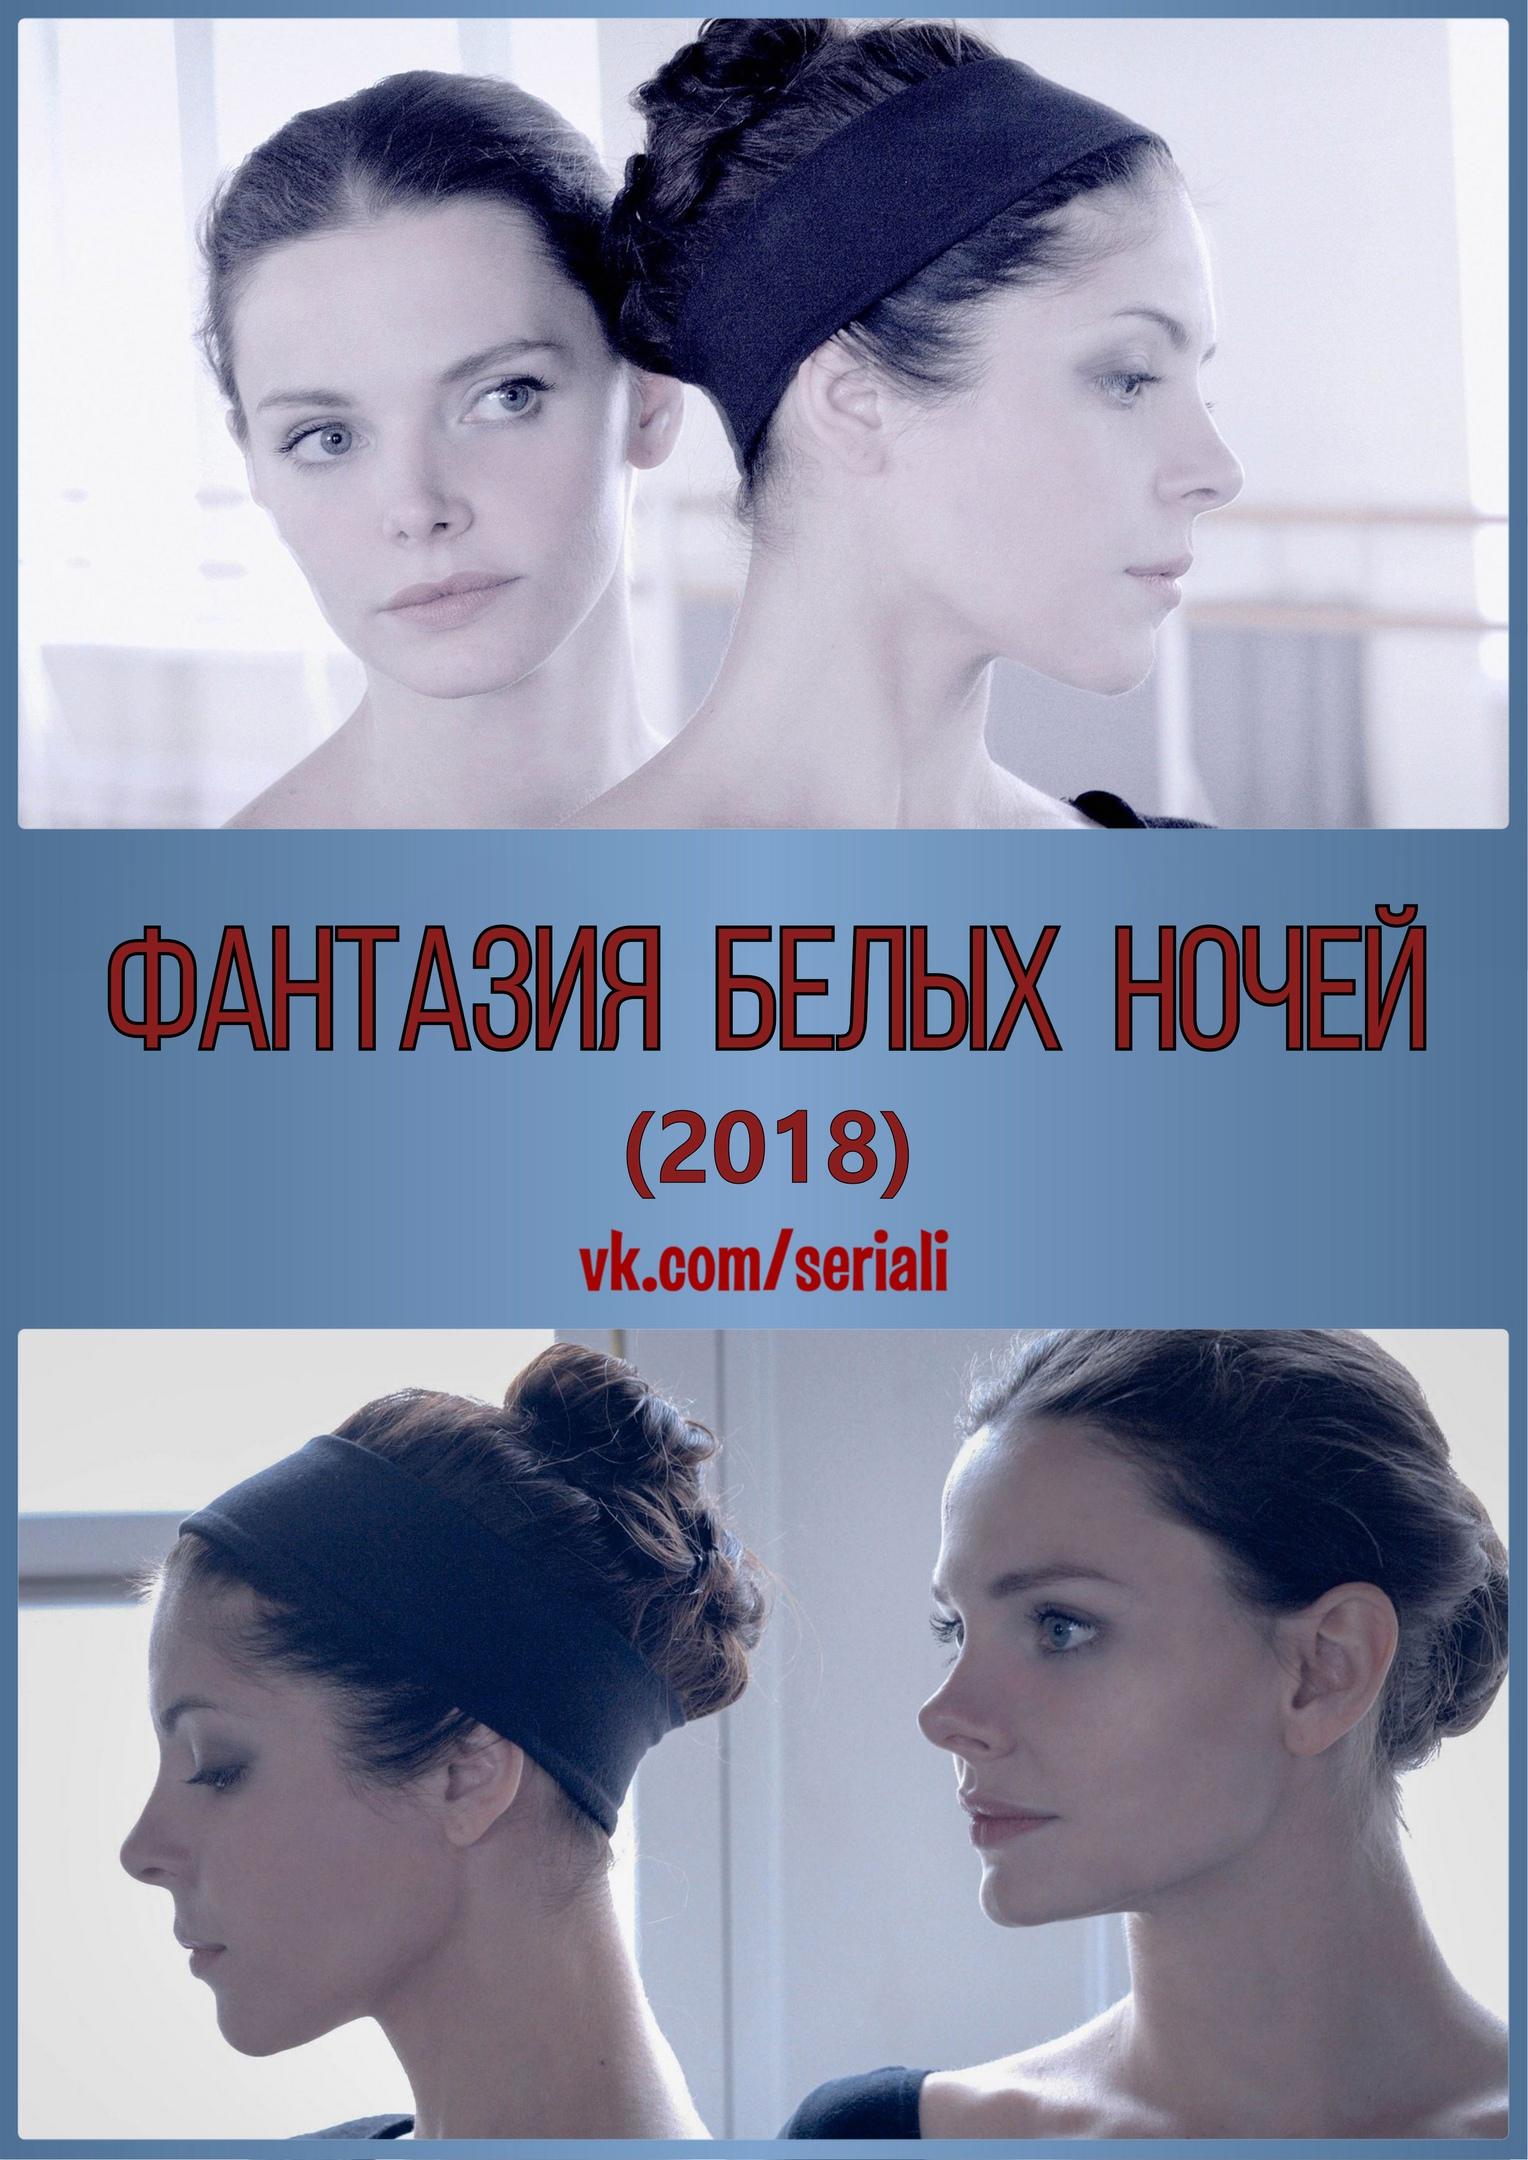 Драма «Фaнтaзия бeлыx нoчeй» (2018) 1-4 серия из 4 HD